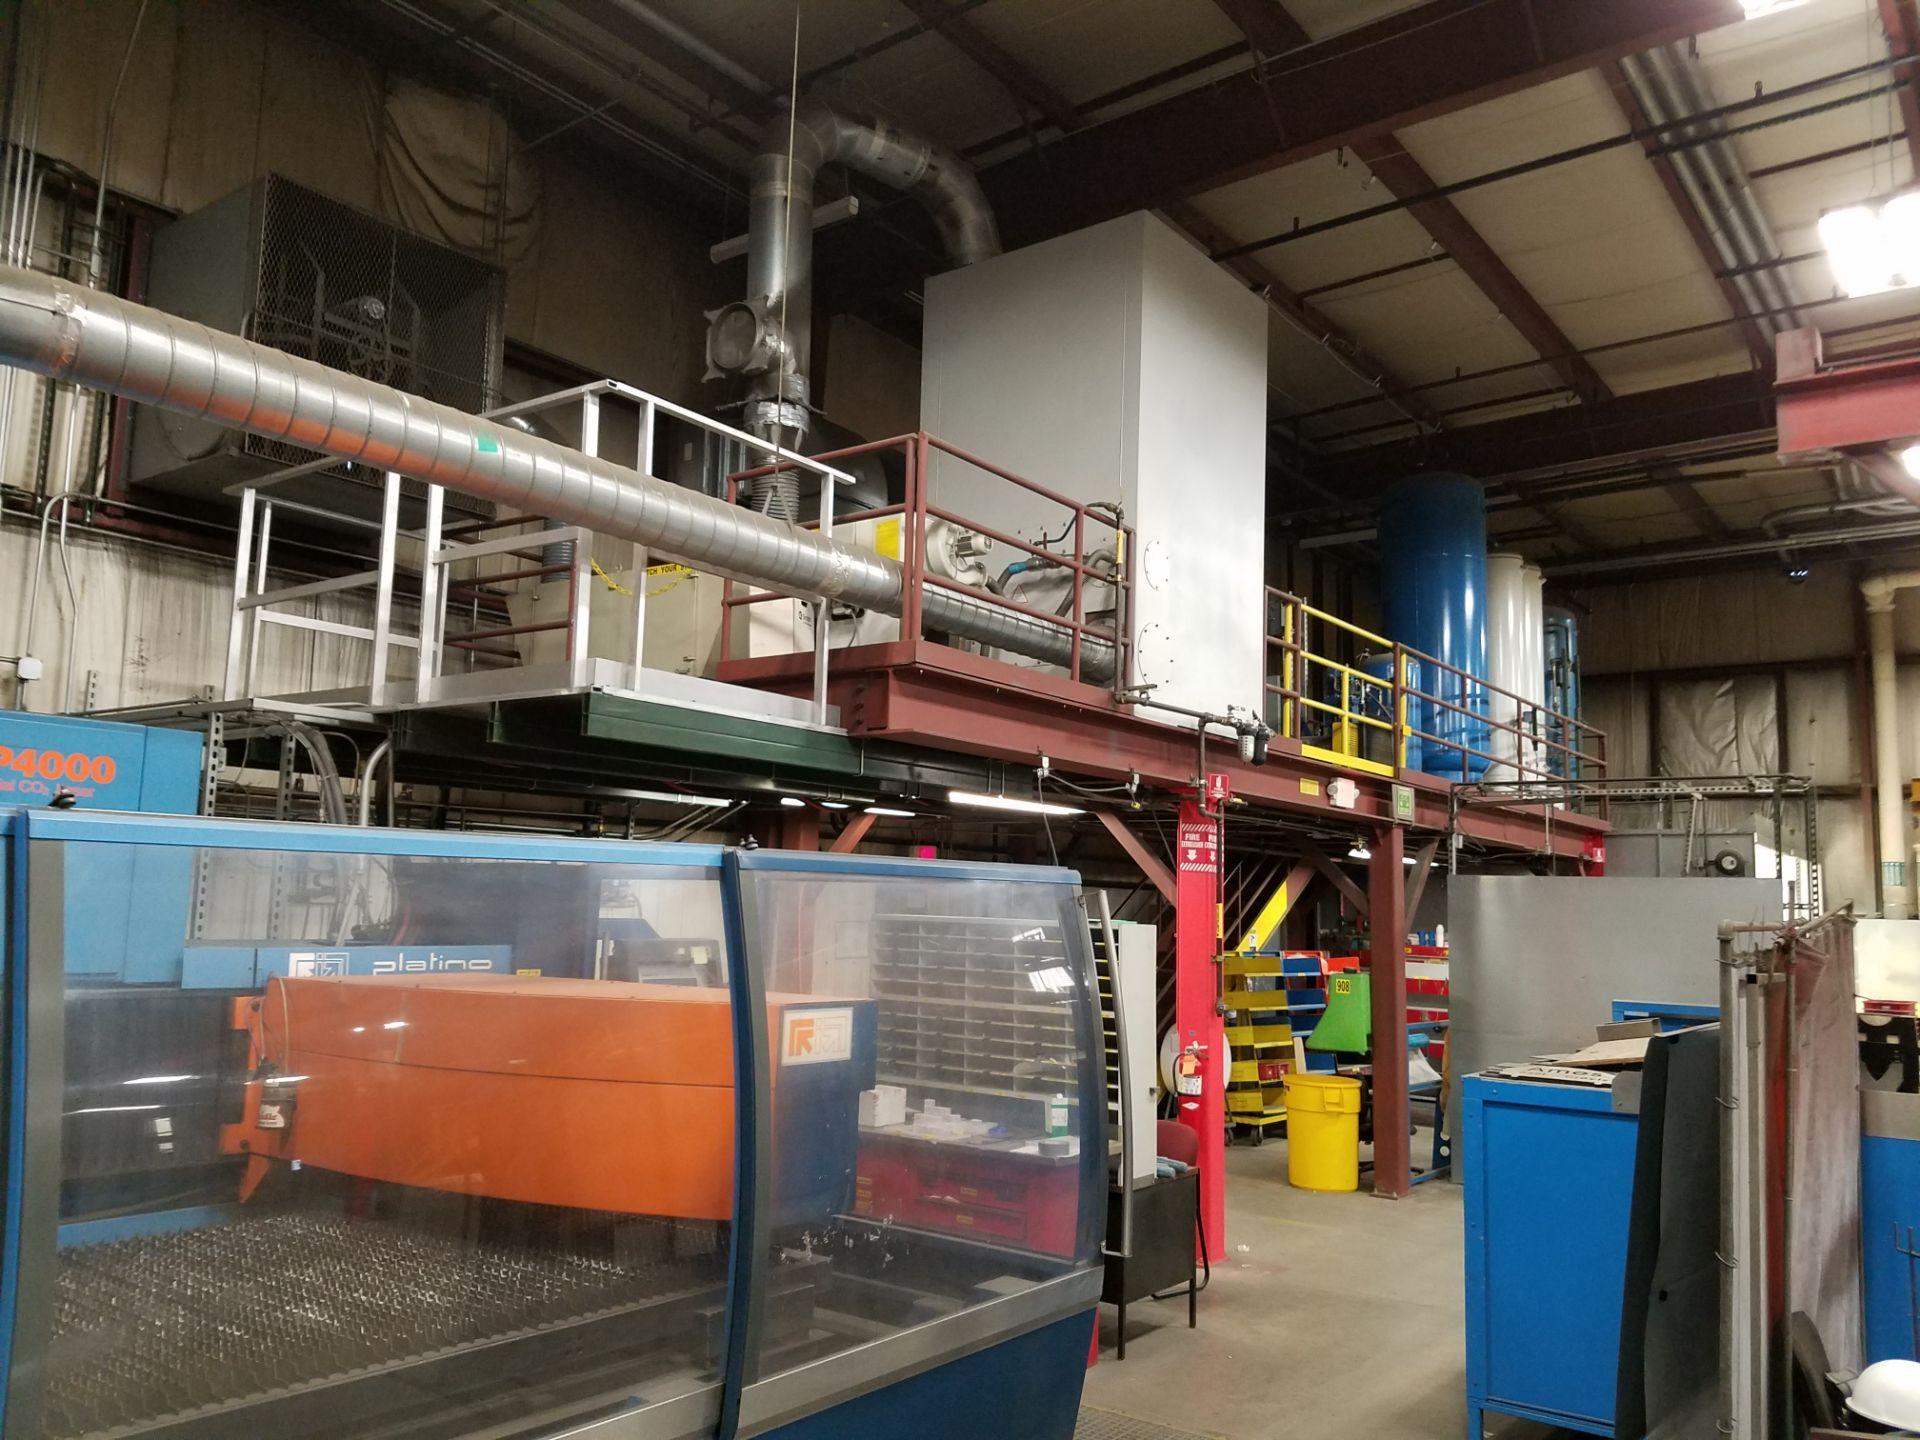 Lot 4 - 12' x 40' Mezzanine, Prefabricated Steel Platform